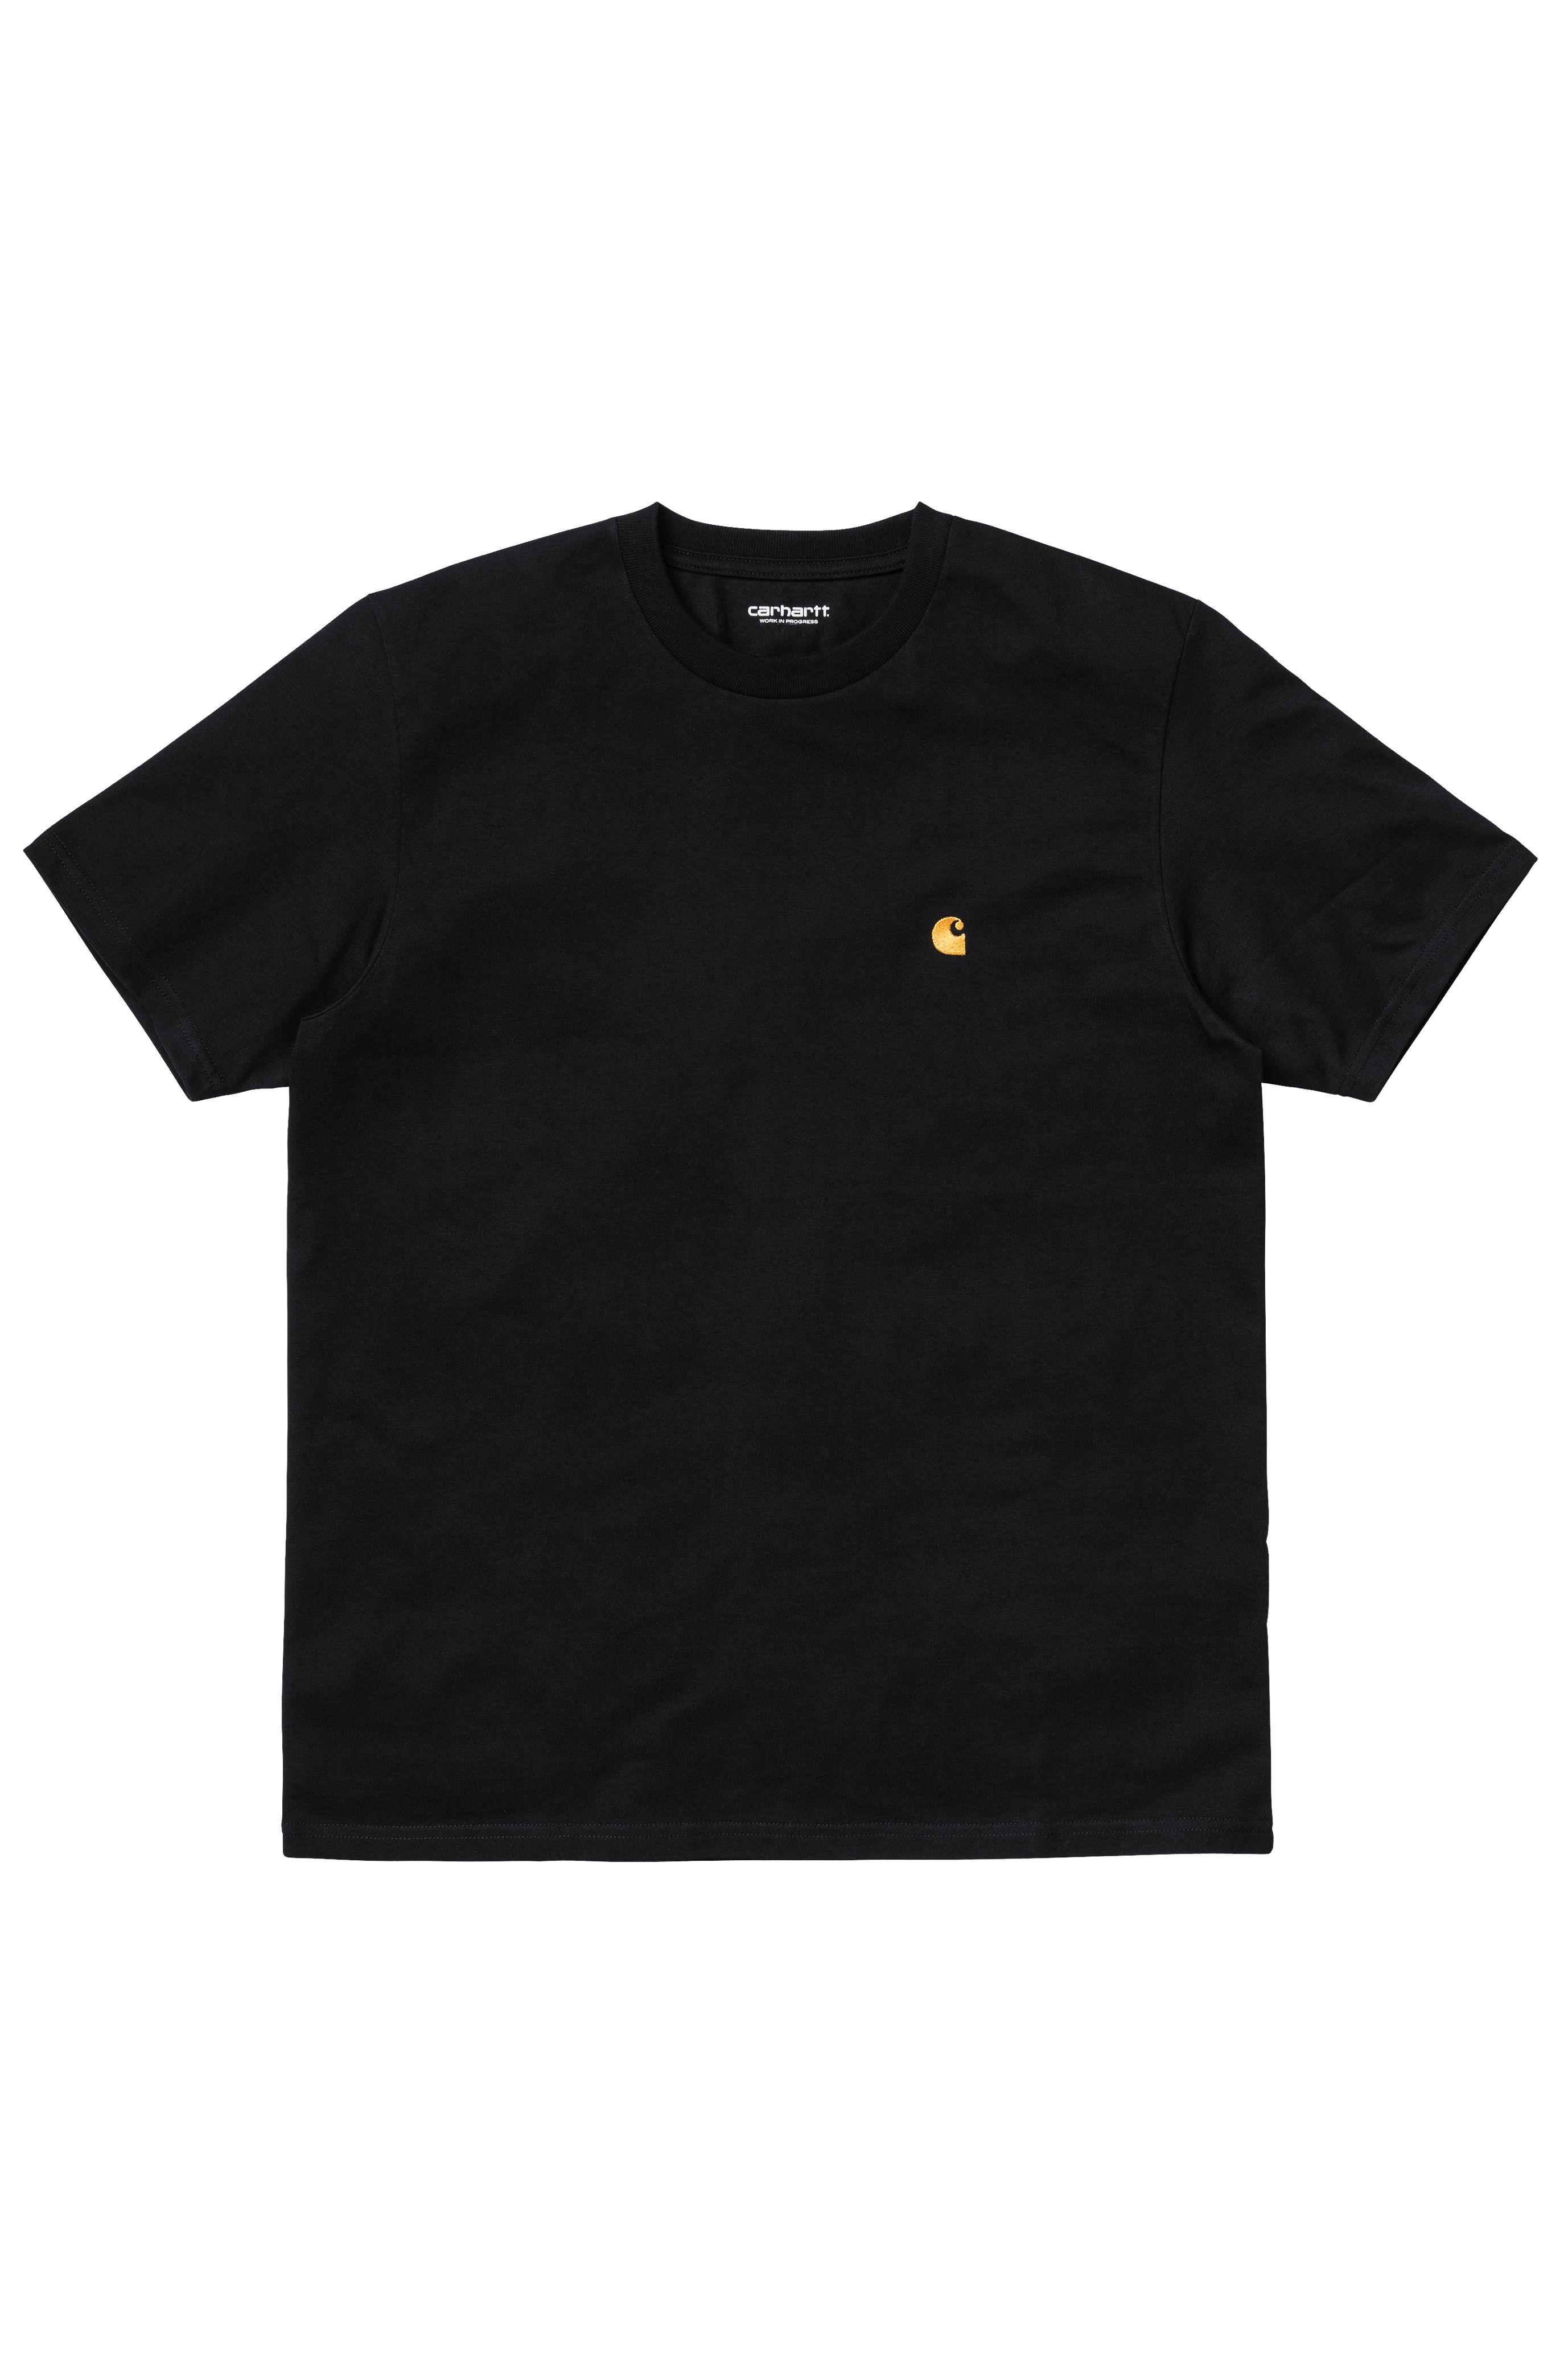 Carhartt WIP T-Shirt CHASE Black/Gold